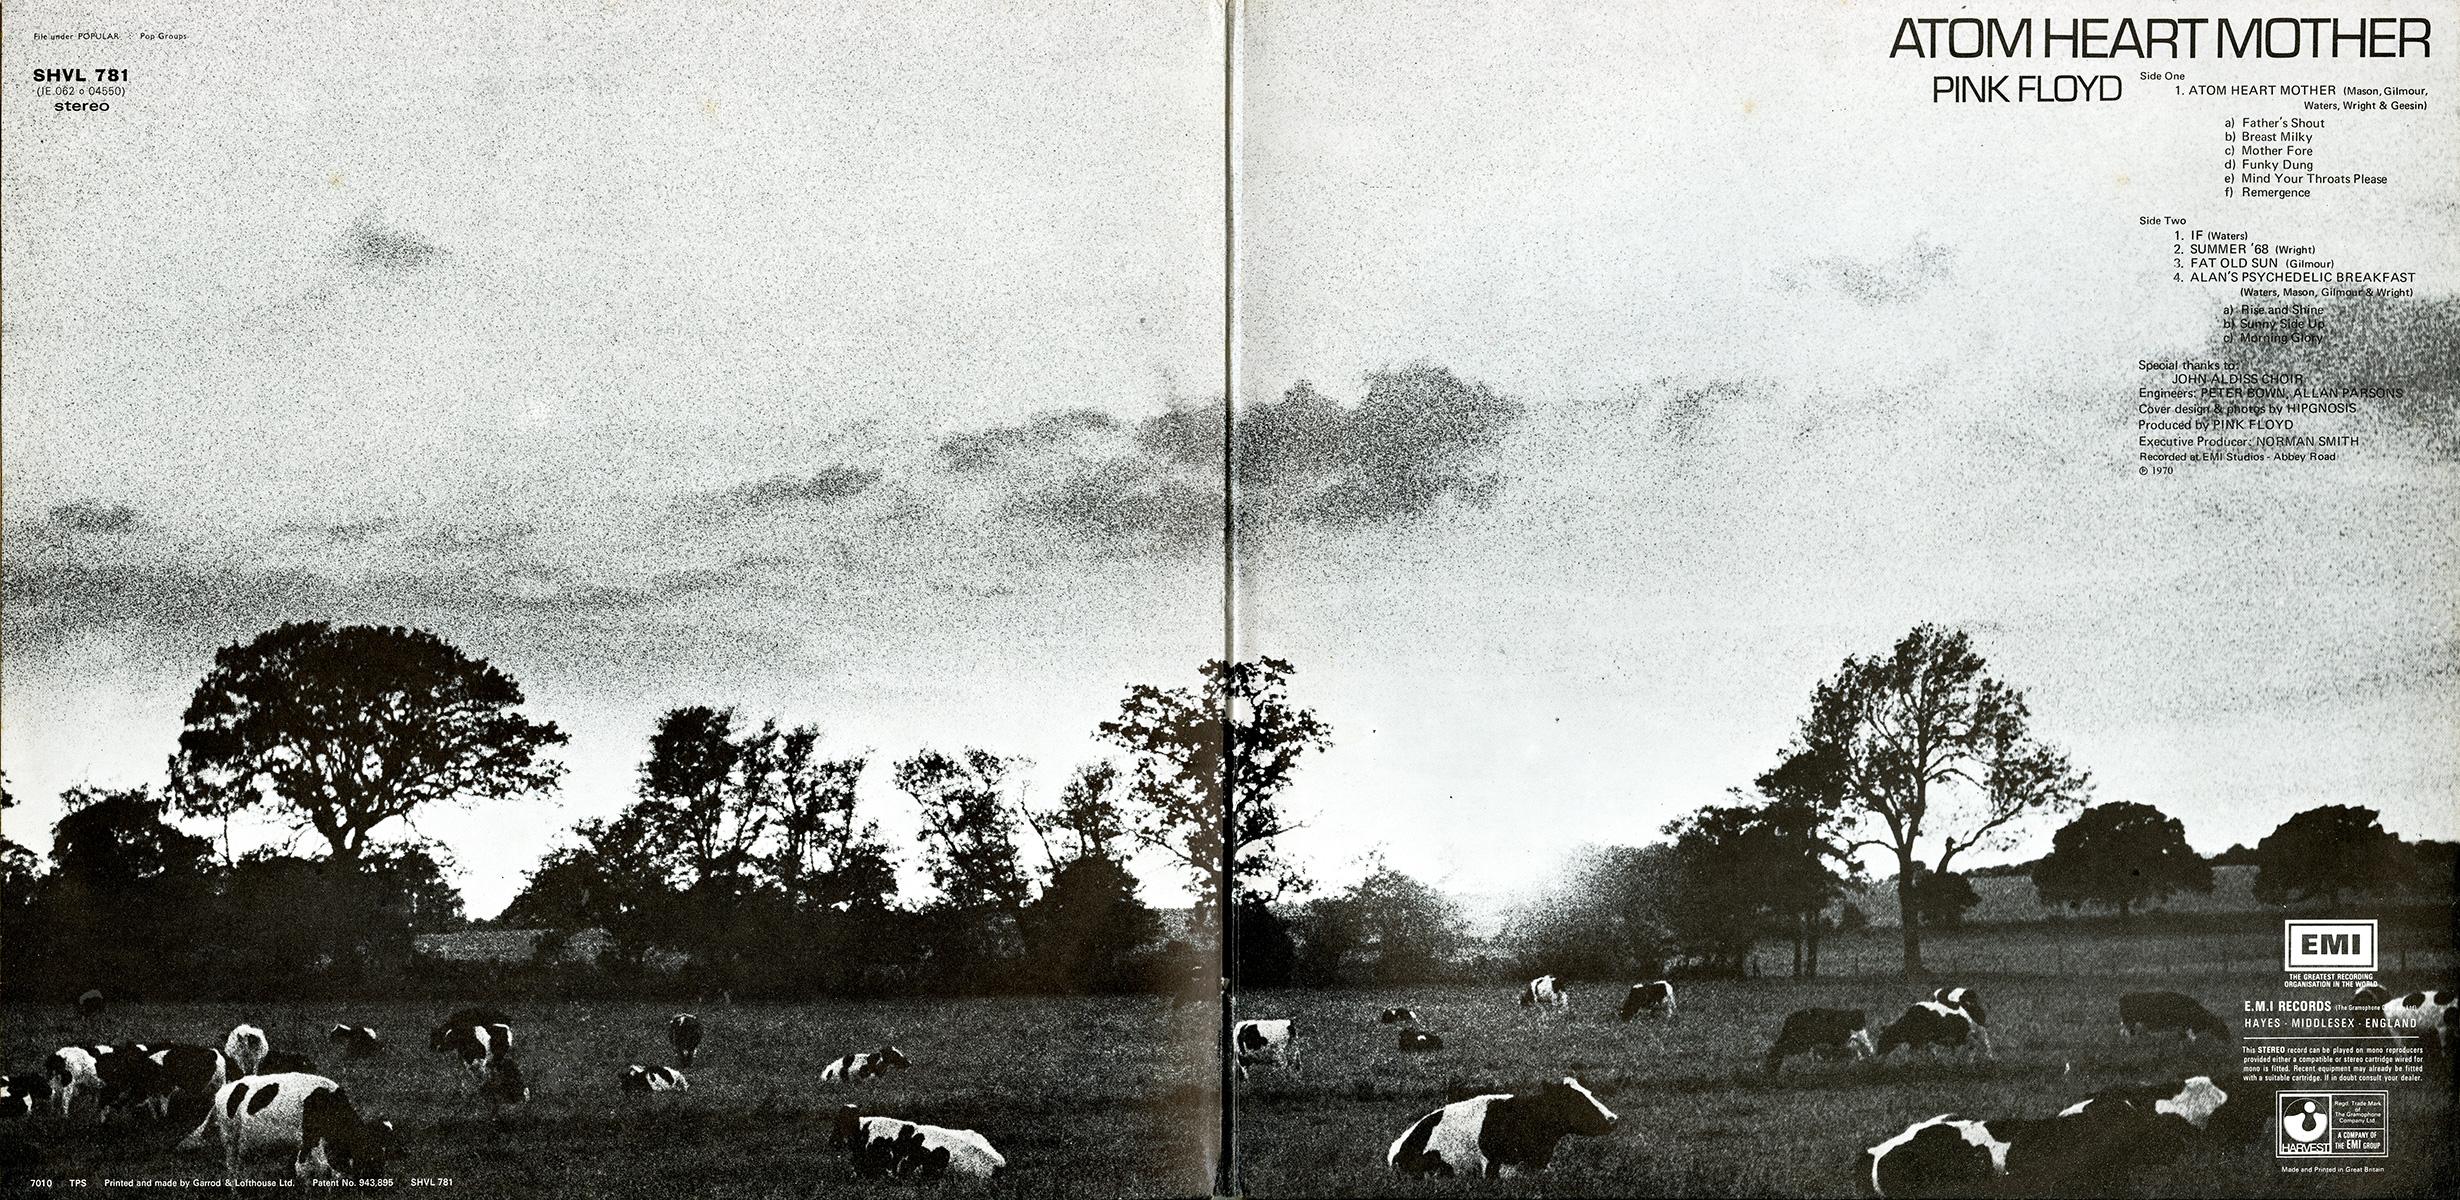 1970 - Atom Heart Mother [PINK FLOYD] [Album STUDIO] IC